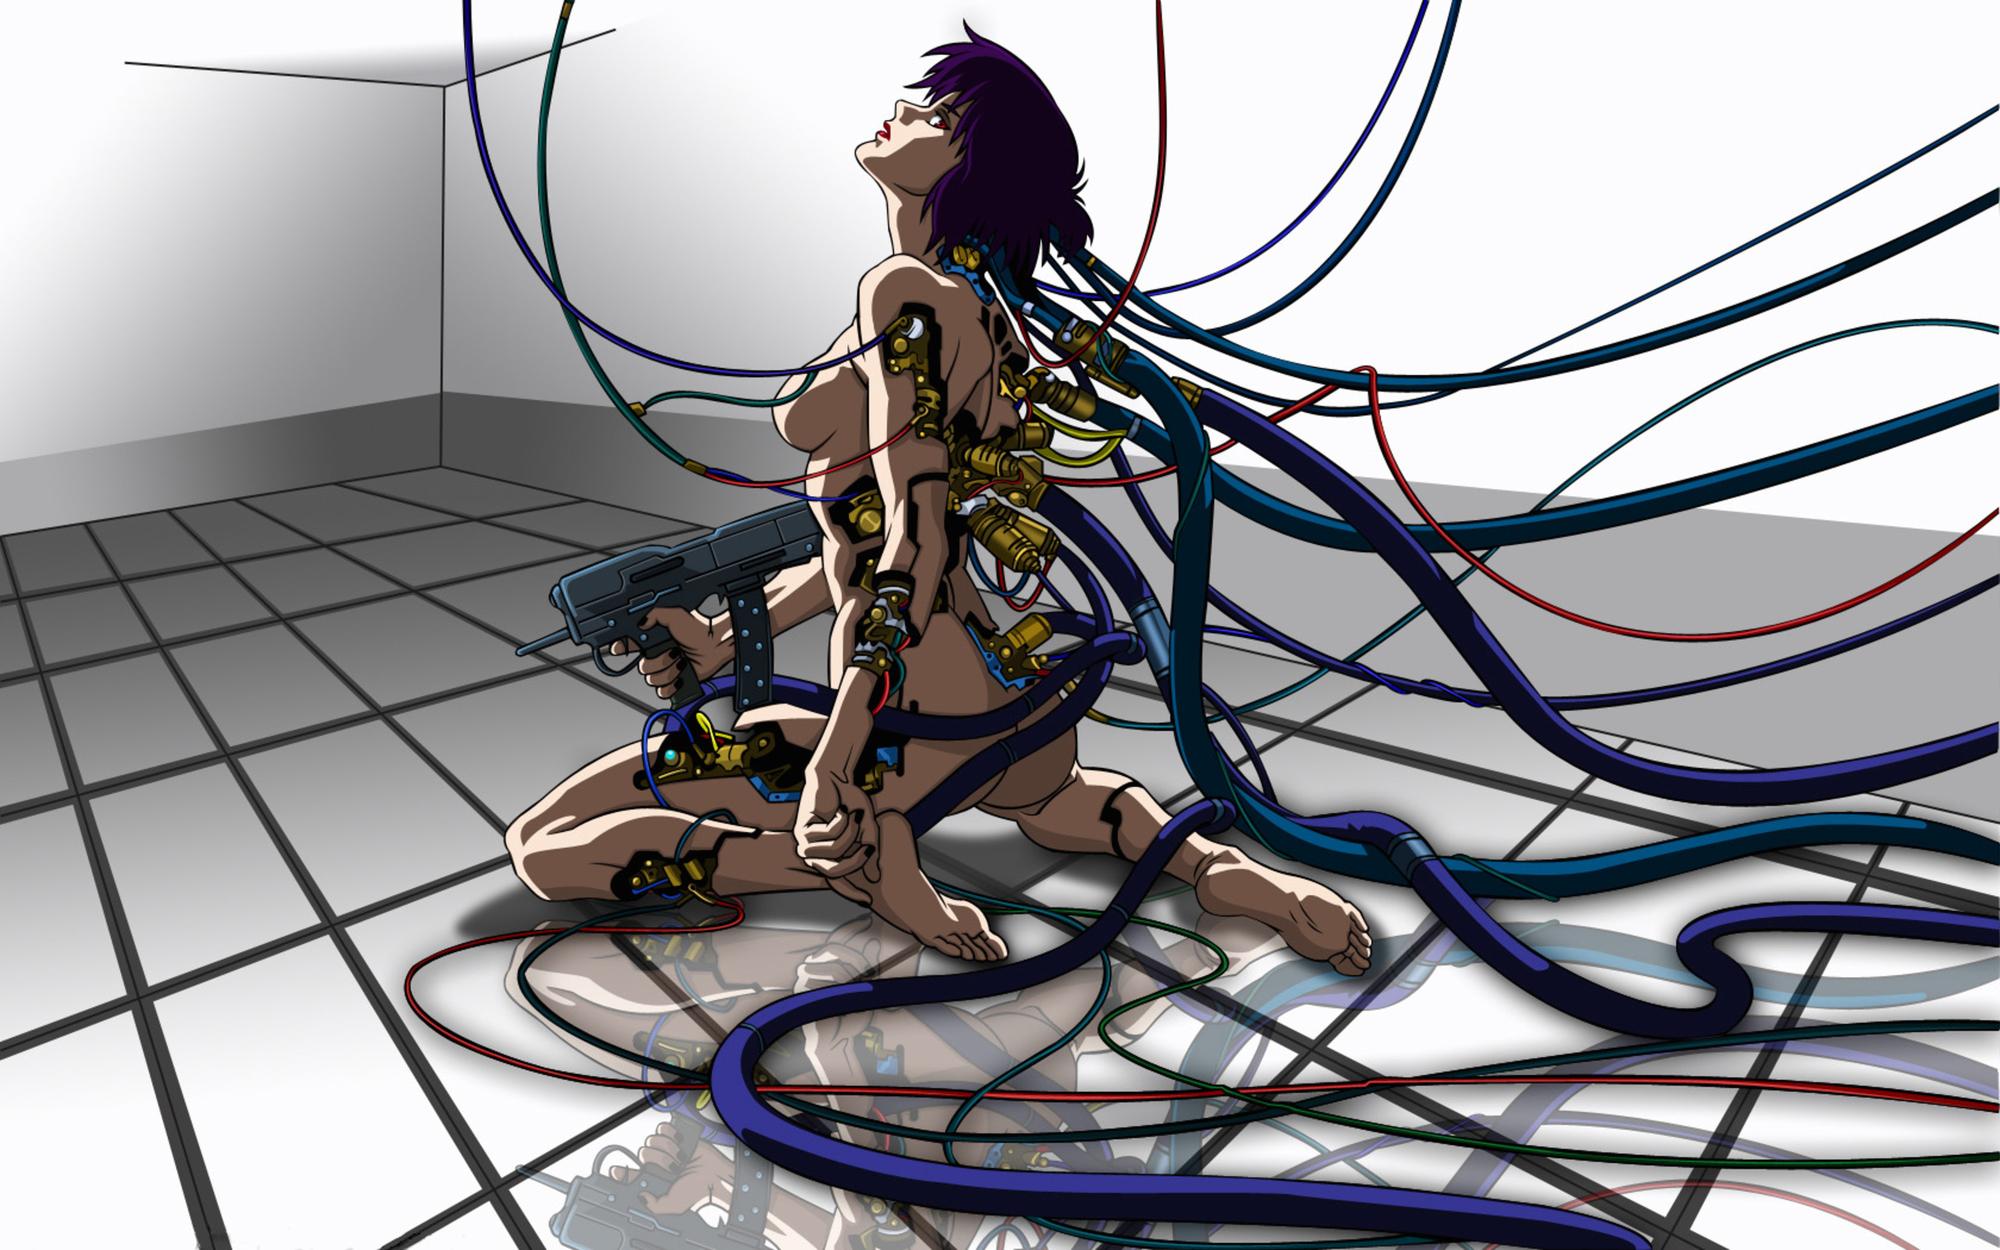 barefoot ghost_in_the_shell gun kusanagi_motoko nude purple_hair red_eyes short_hair weapon